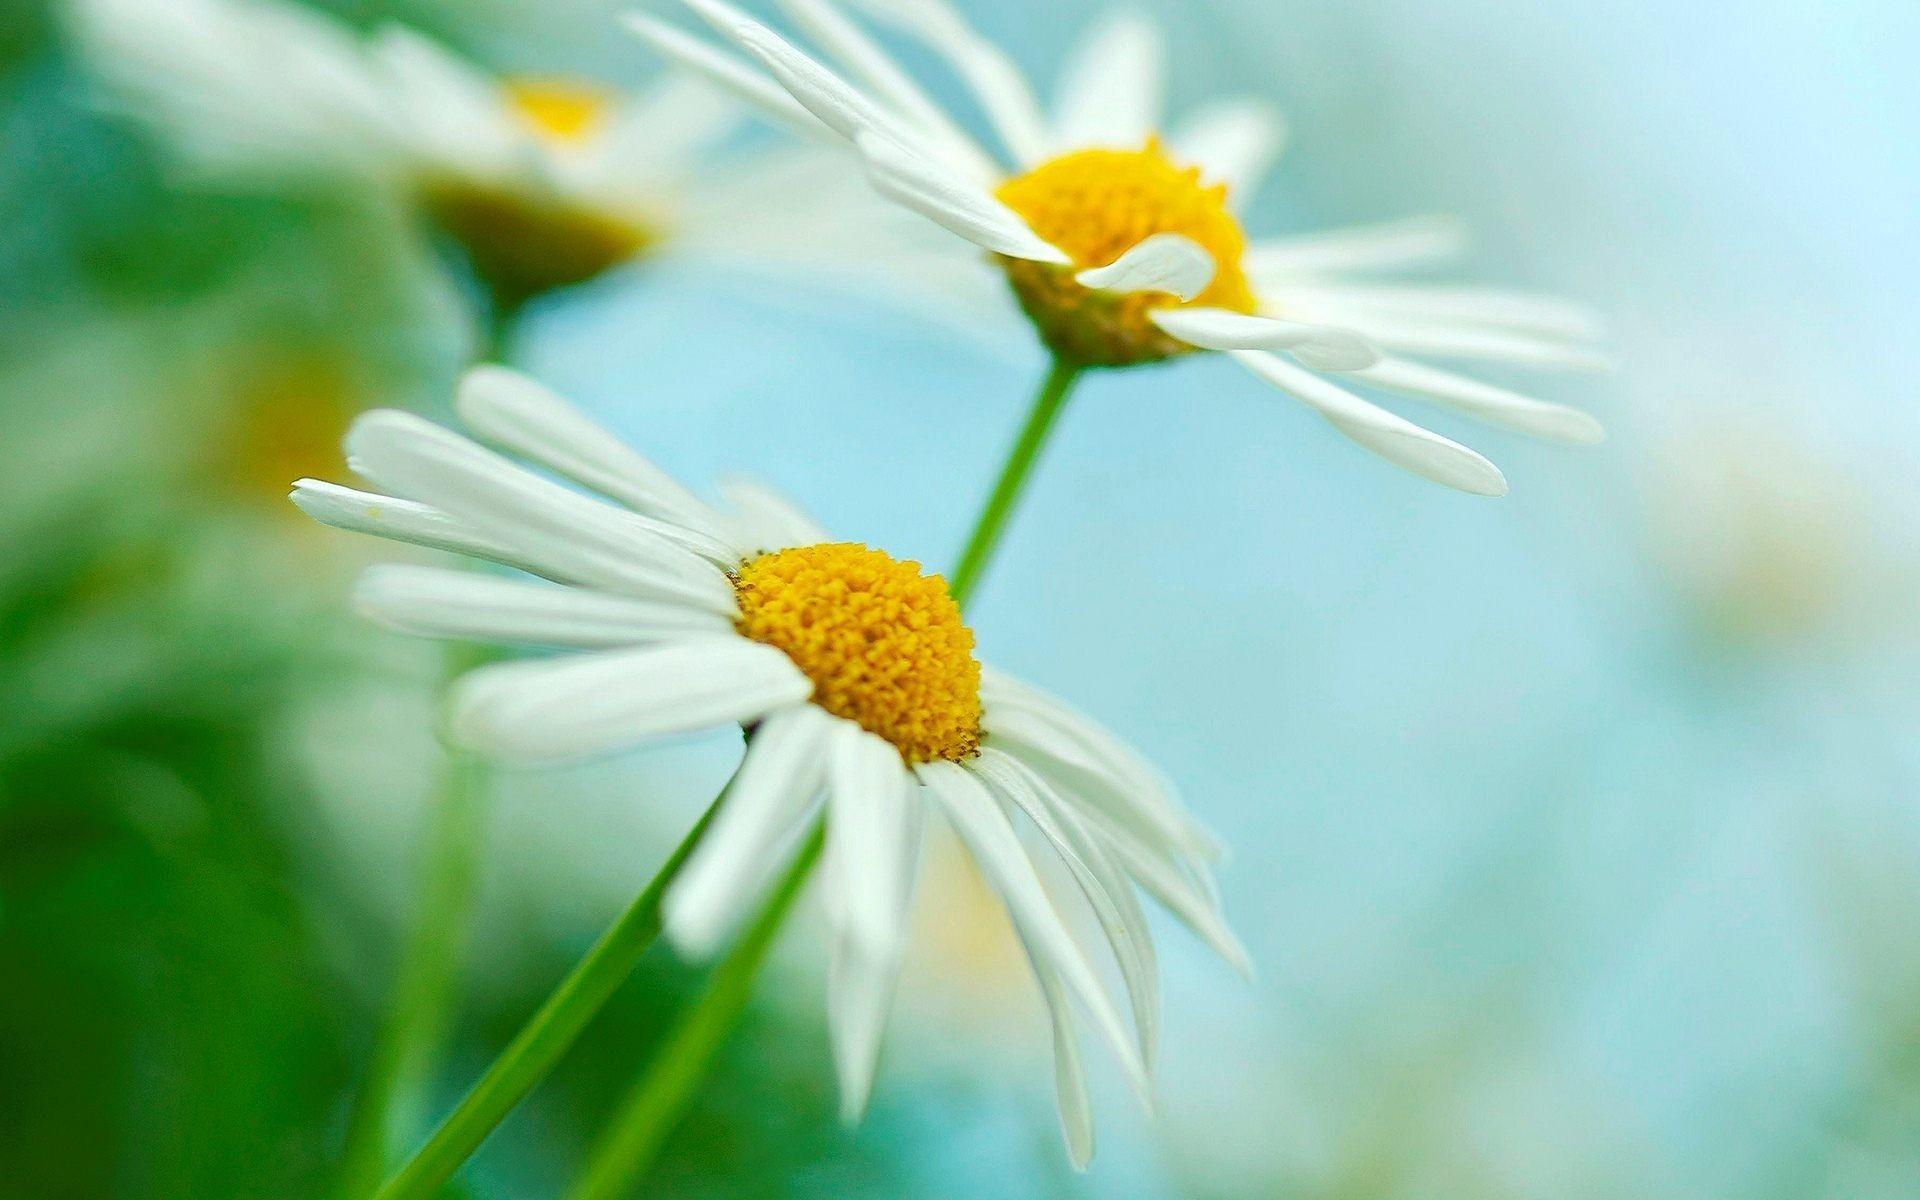 1920x1200, Gerbera Daisies White Flowers Wallpaper - Best Daisies Background - HD Wallpaper